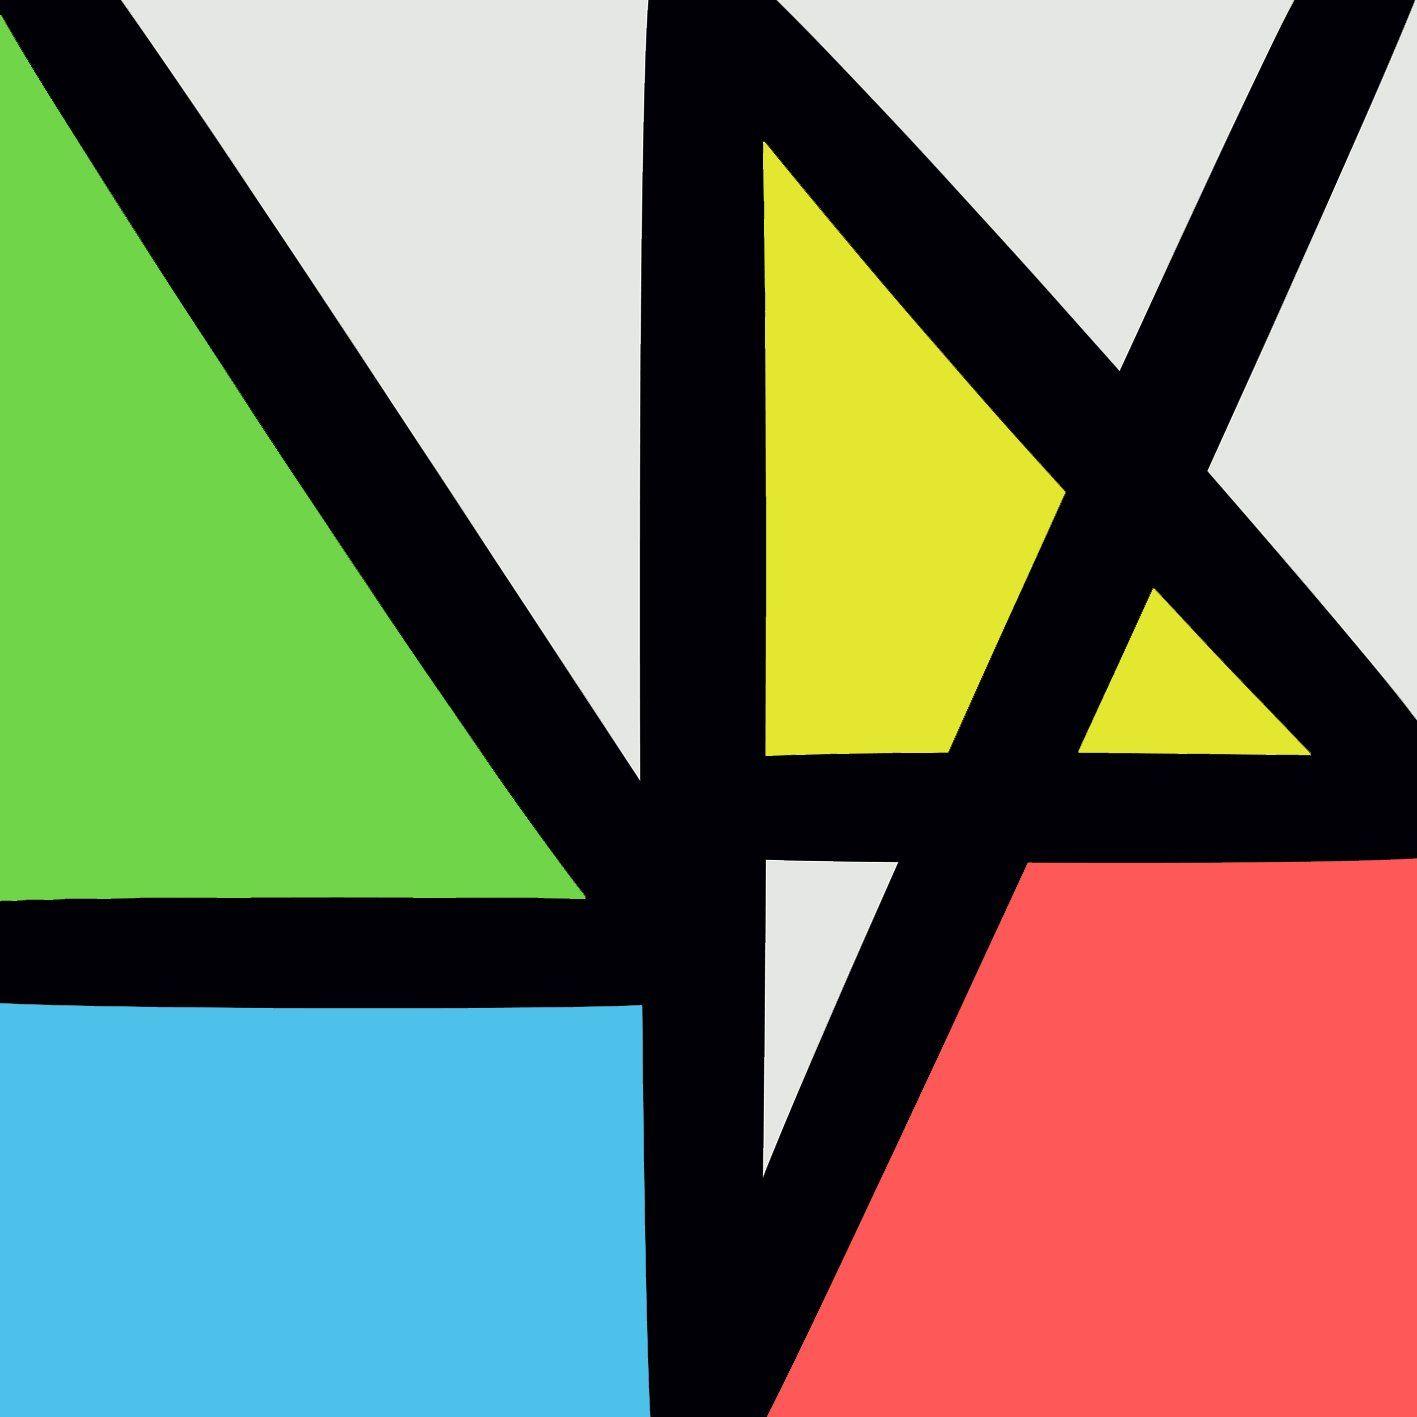 Peter Saville - New Order 2015